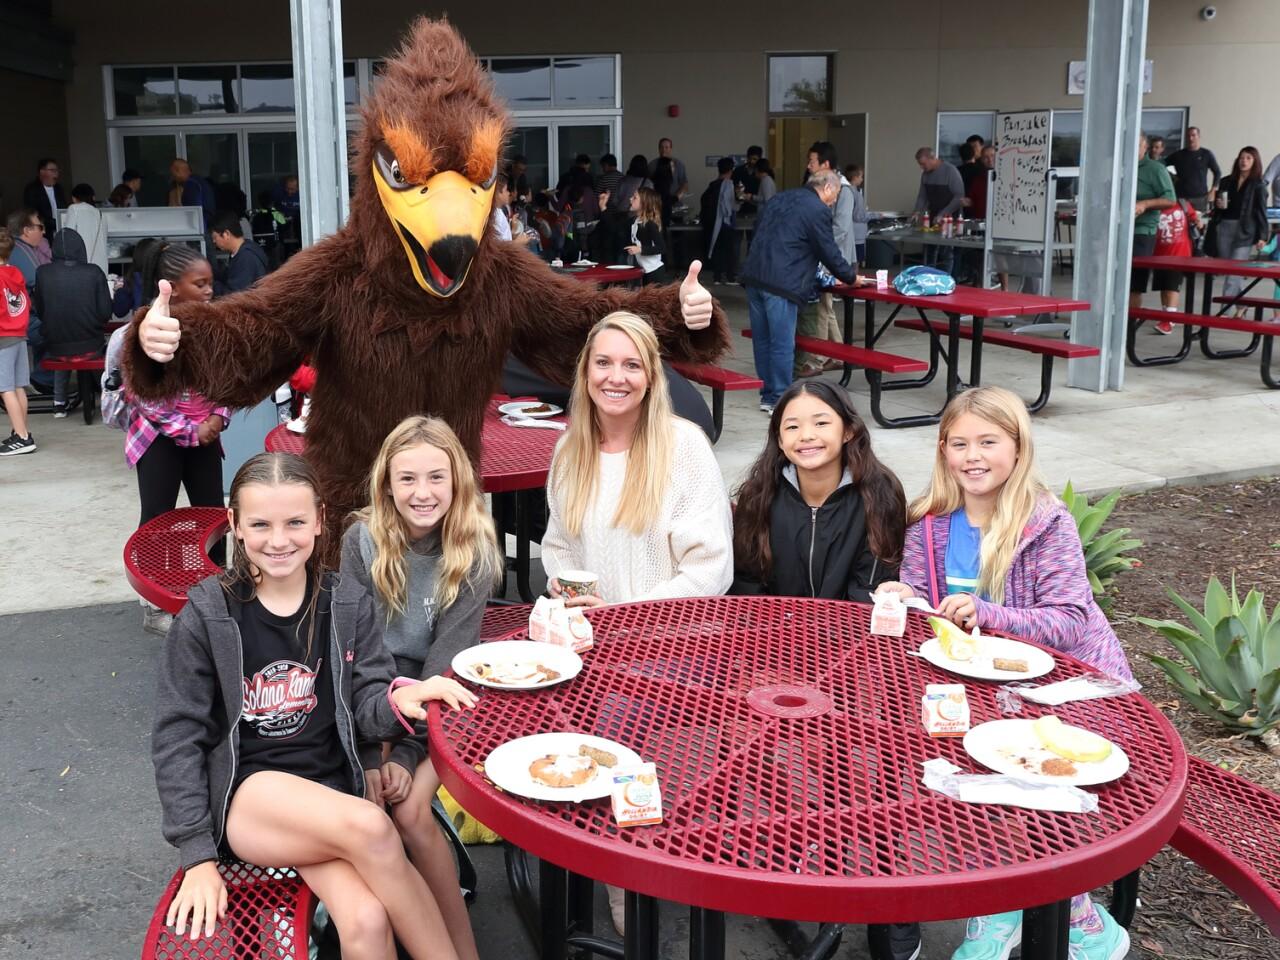 The Hawk mascot joins Madeline McCallion, Taylor Ehlers, Heather Balaban, Kylie Clark, Allison Newson